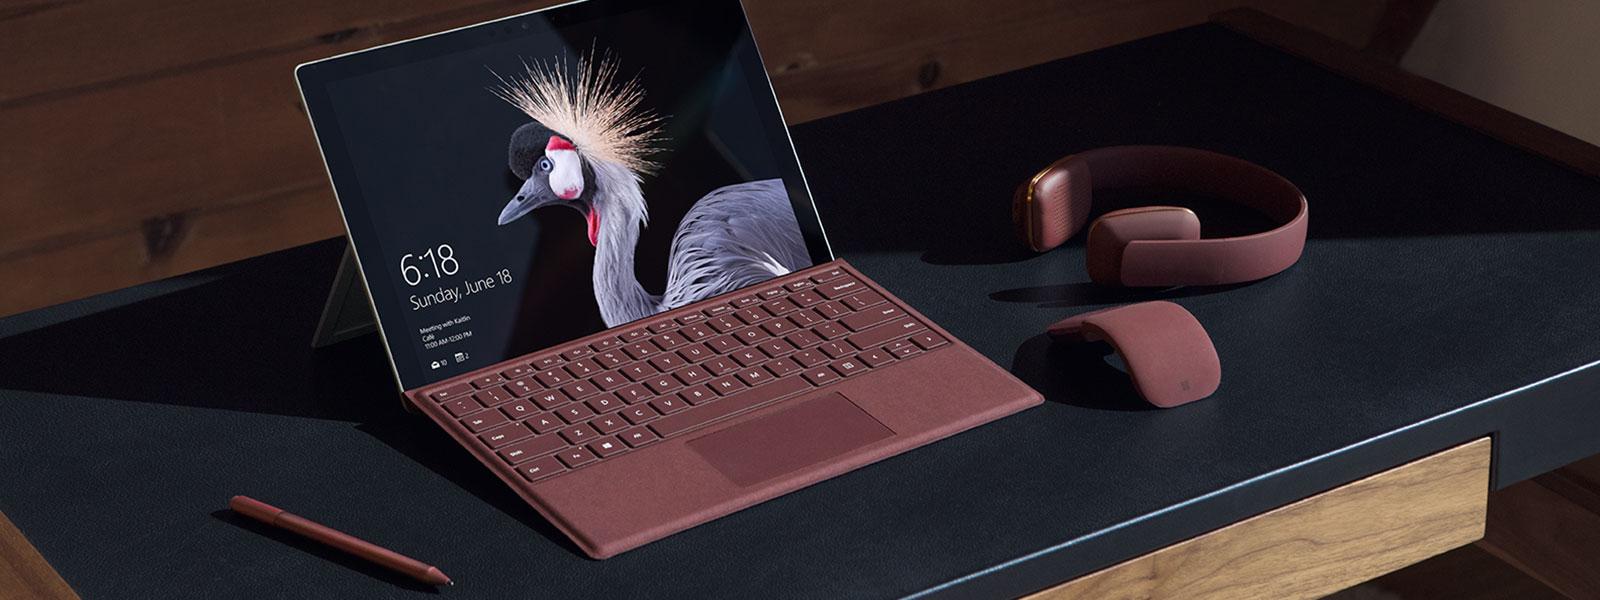 Surface Pro Signature ã¿ã¤ã ã«ãã¼